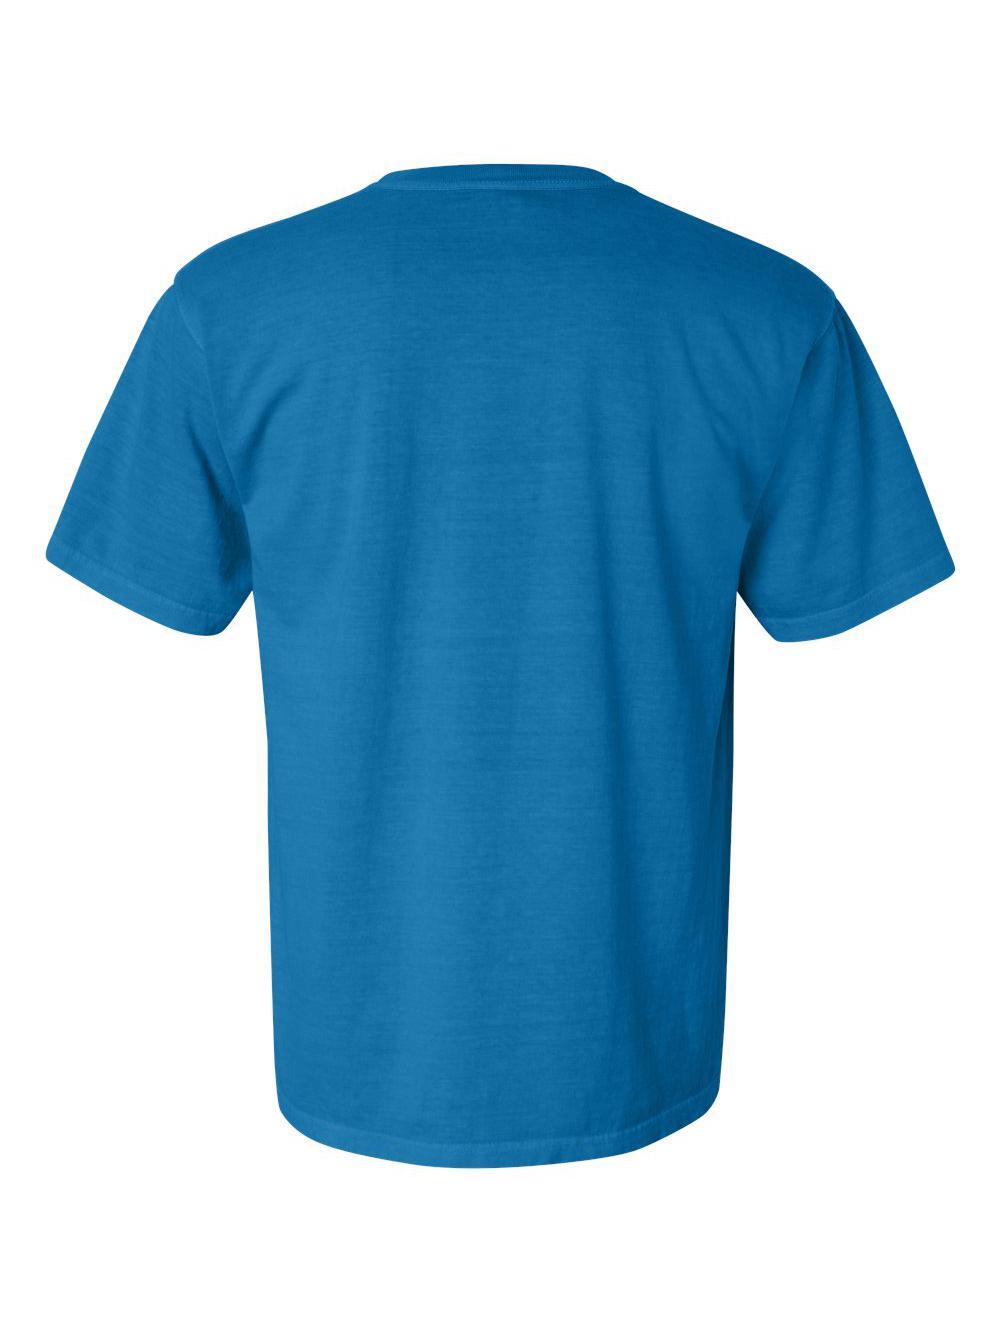 Comfort-Colors-Garment-Dyed-Heavyweight-Ringspun-Short-Sleeve-Shirt-1717 thumbnail 109